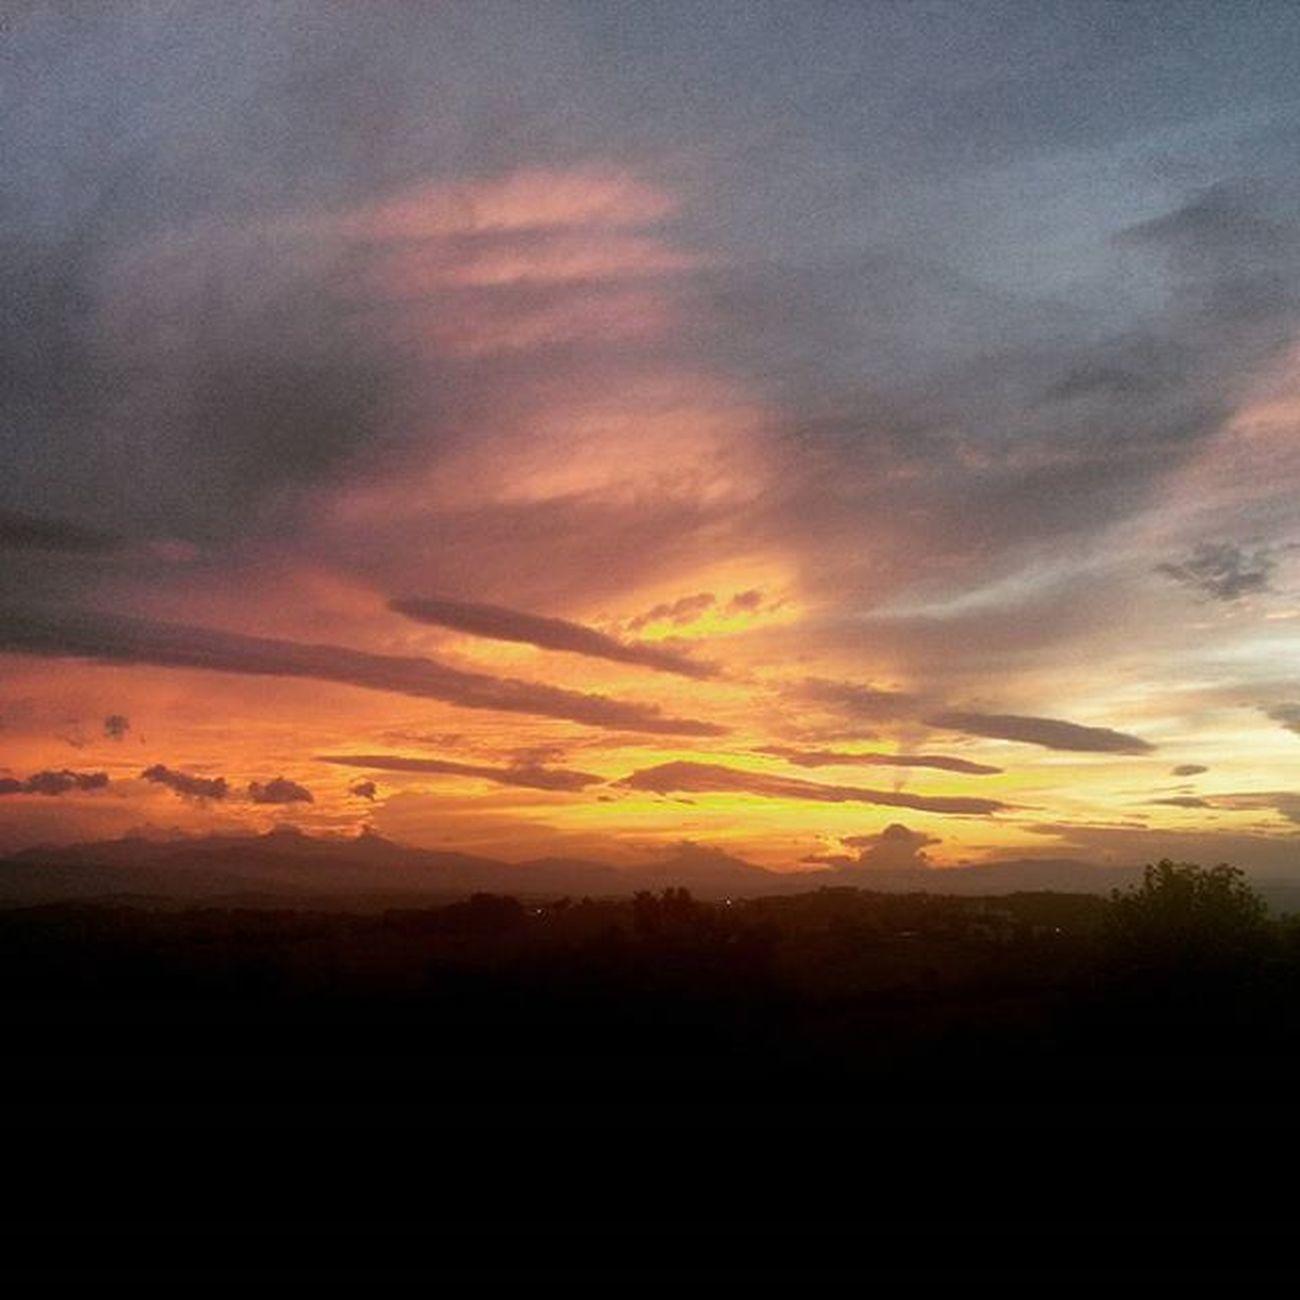 Tramonto Panorama Paesaggio Sun Sunset Sunlight Nature Natura Naturelovers Marche Marcheforyou Igersmarche Igersitalia Italia Italy Liveloveitalia Lategram Cielo Sky Skylovers SkyClouds Clouds Cloudscape Landscape